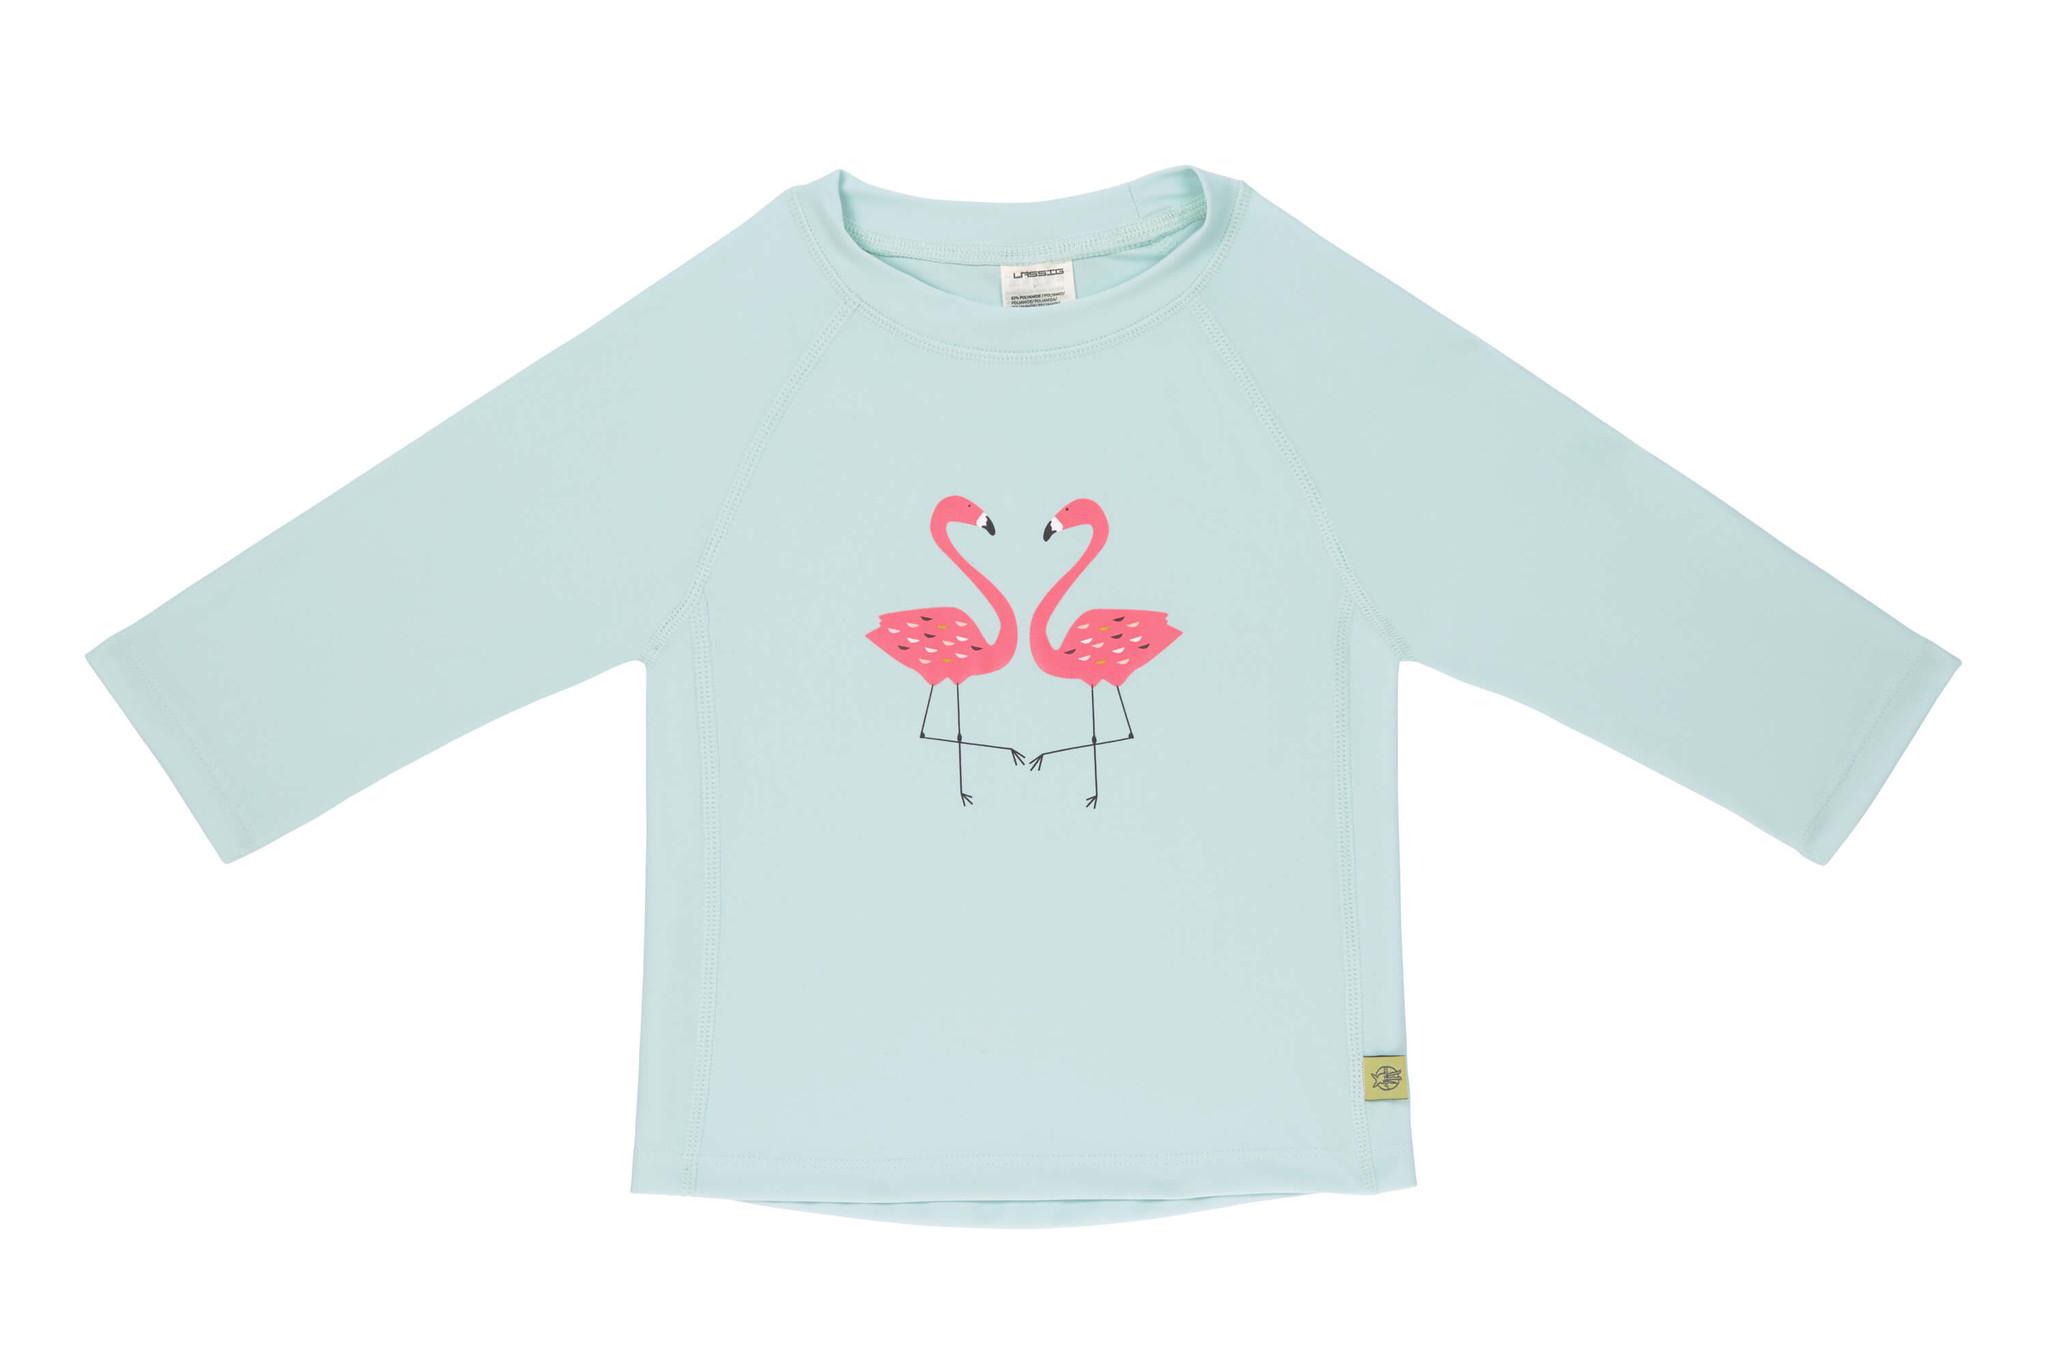 Lässig Lässig Splash & Fun Lange mouw Rashguard / zwemshirt - flamingo